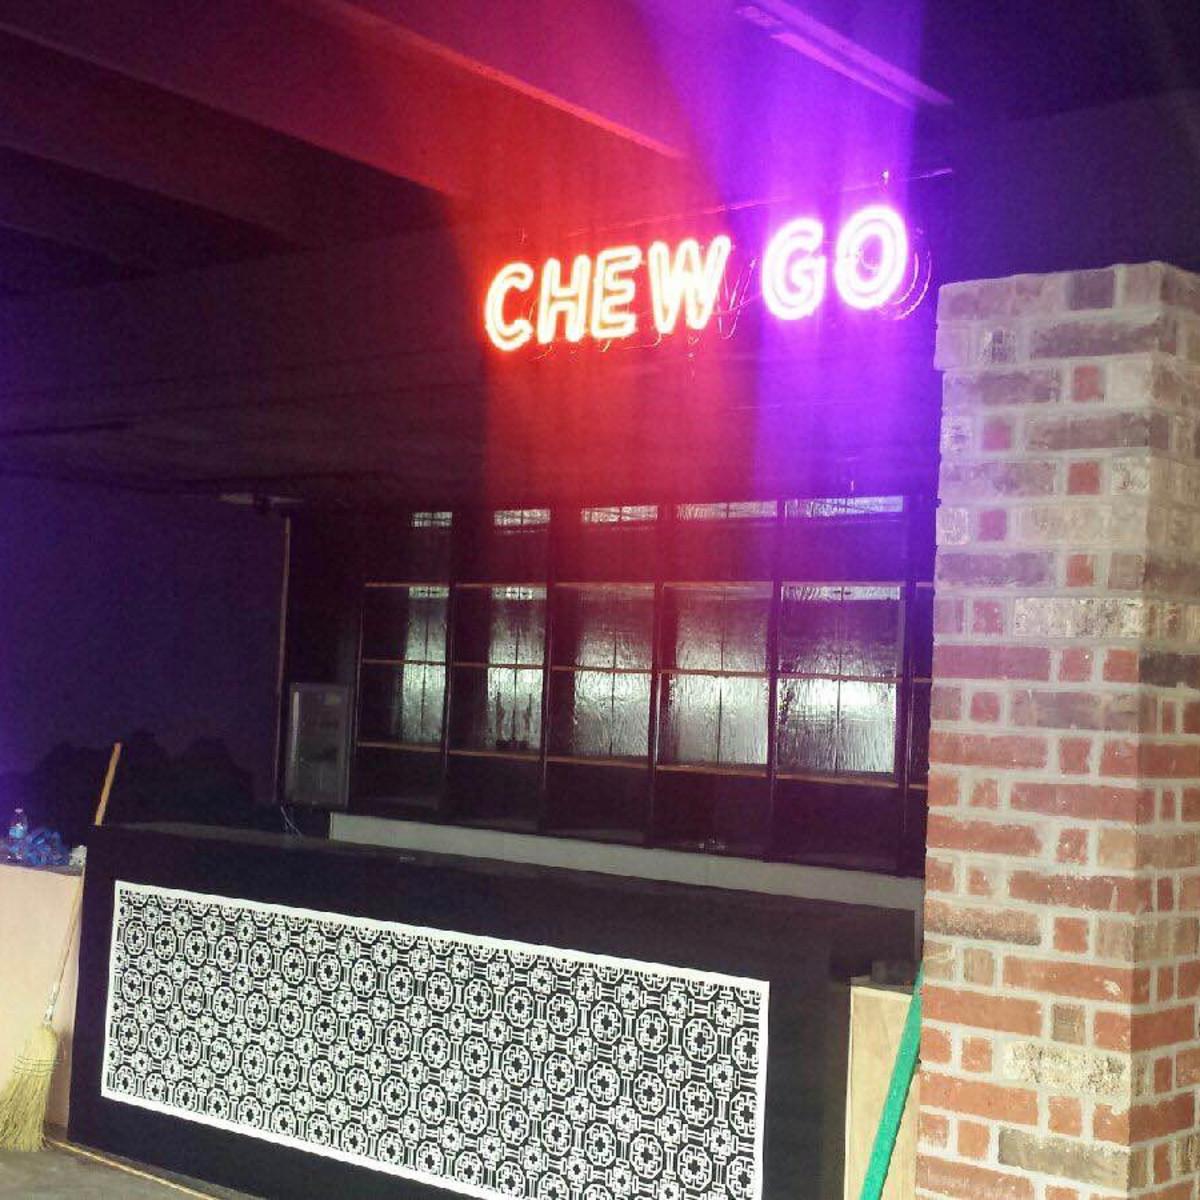 Jimmy Chew's Asian Kitchen interior